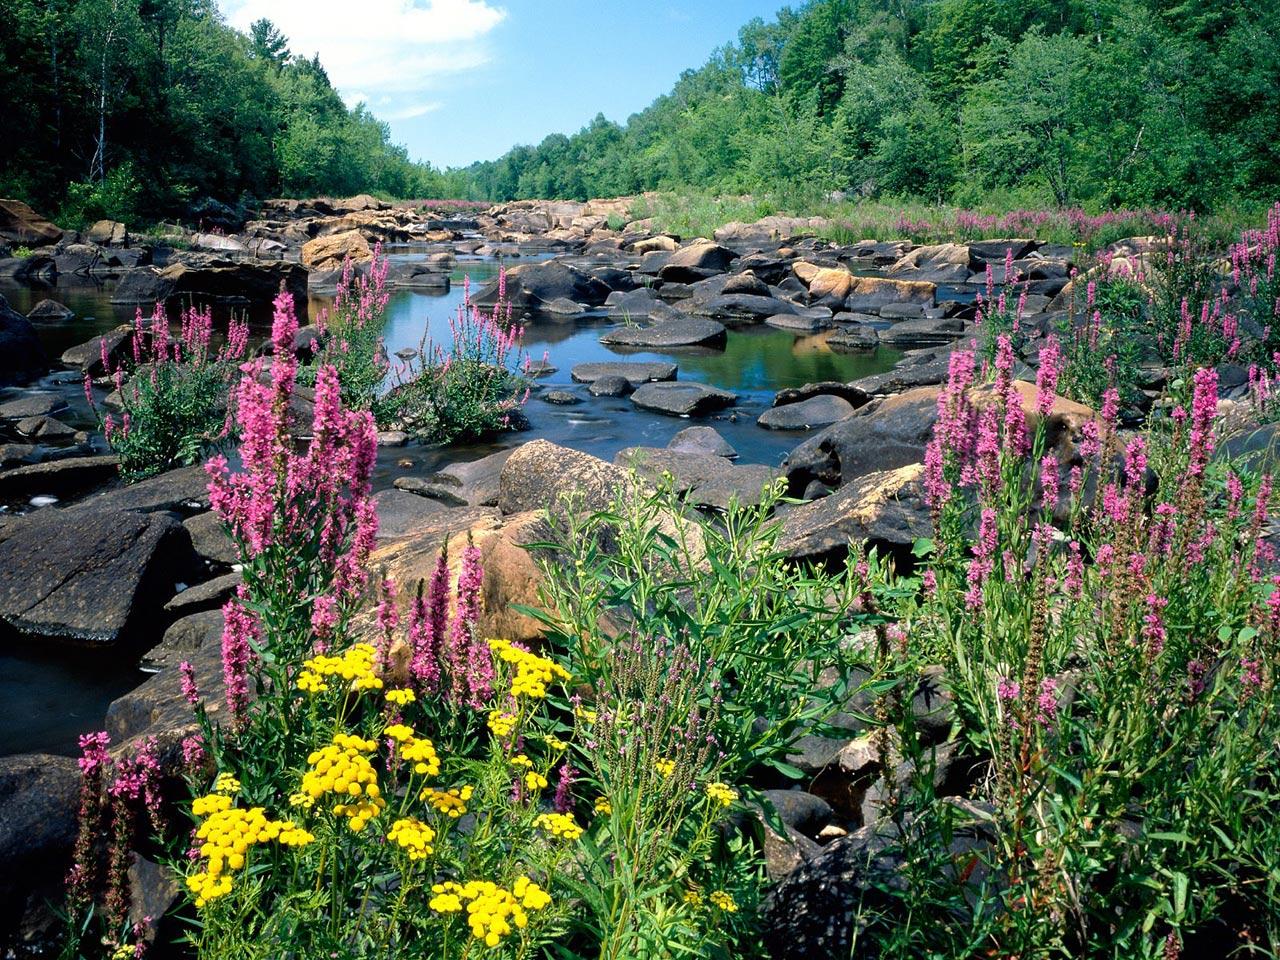 http://4.bp.blogspot.com/_FQx4JXMzHVQ/TMcmSPtRemI/AAAAAAAAB5g/LbjLQFt10Fg/s1600/Wisconsin_River%252C_Ice_Age_National_Scientific_Reserve%252C_Wisconsin.jpg